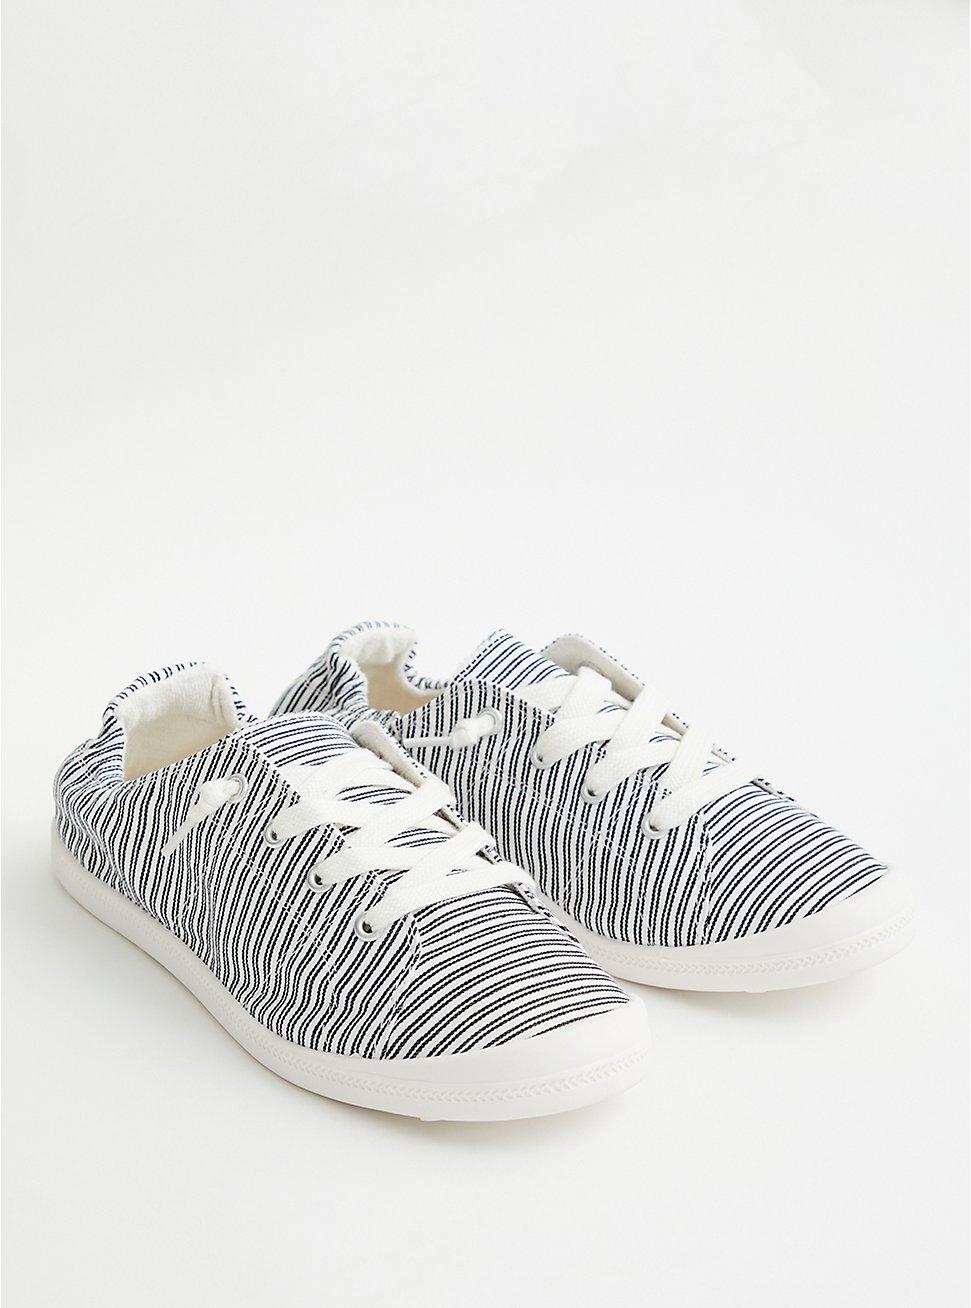 Riley - Black & White Stripe Canvas Sneaker, BLACK-WHITE, hi-res